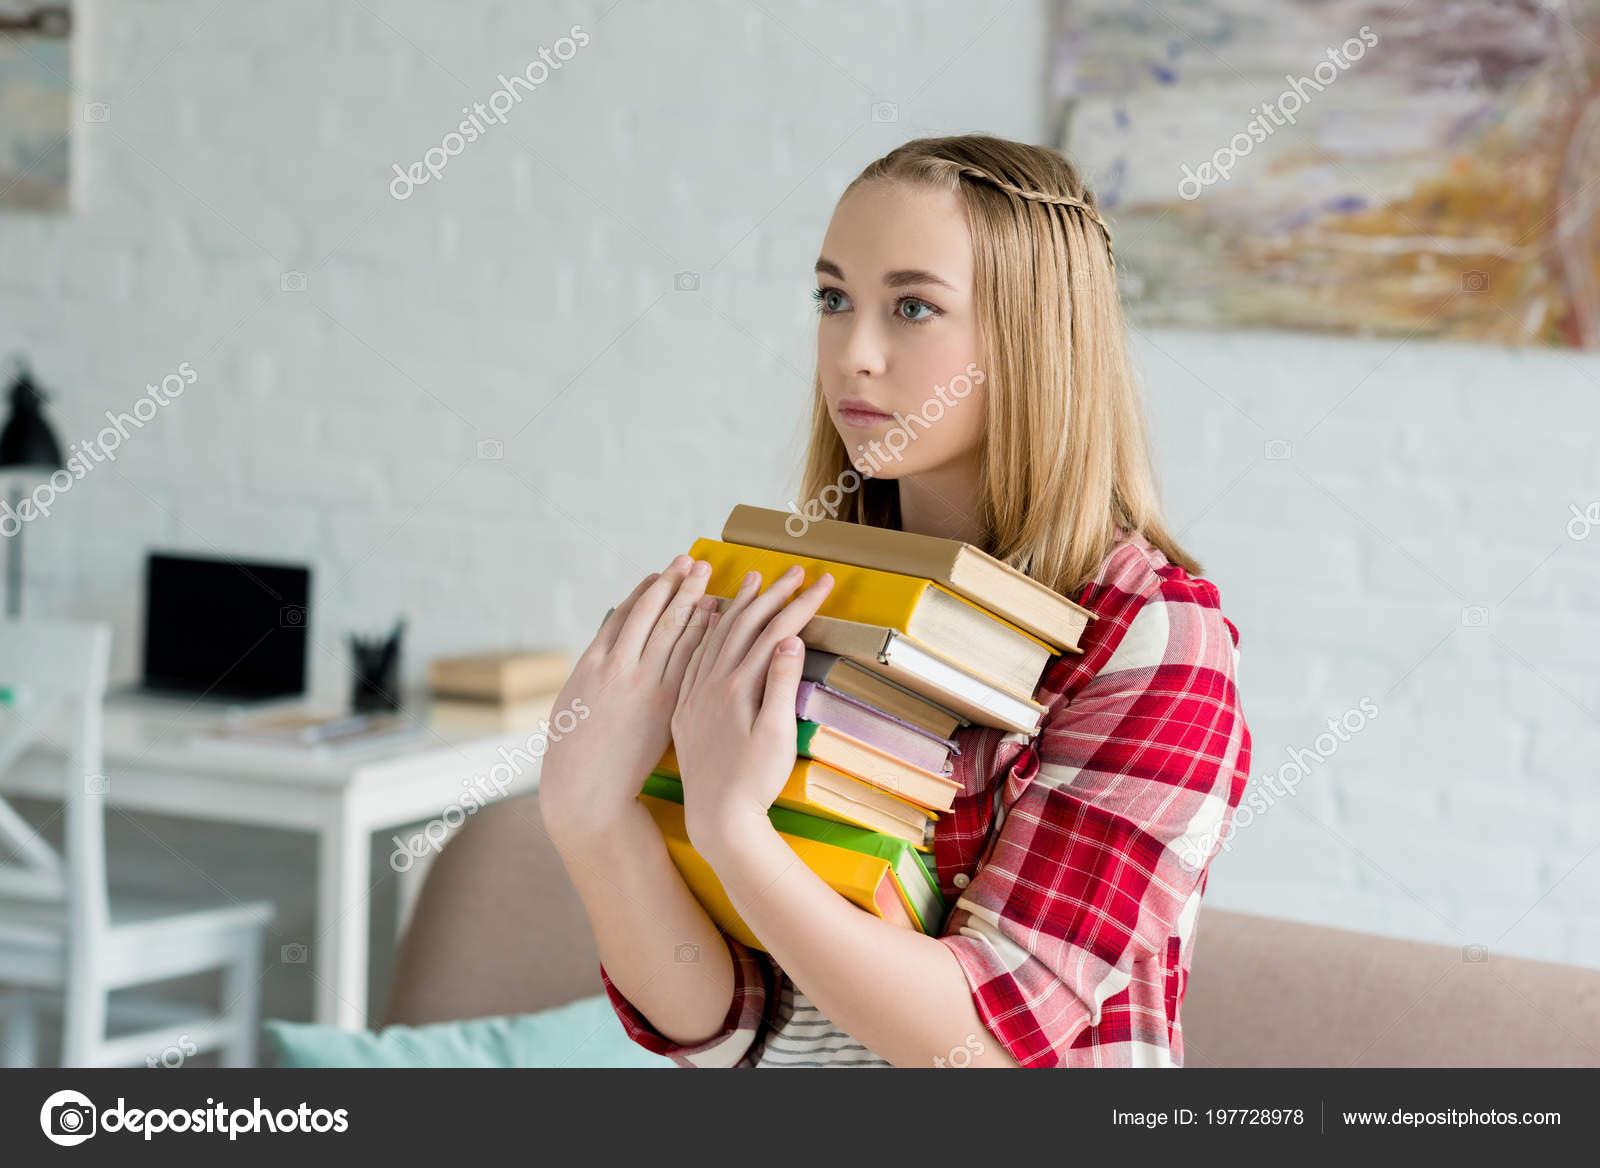 młody napalony nastolatek